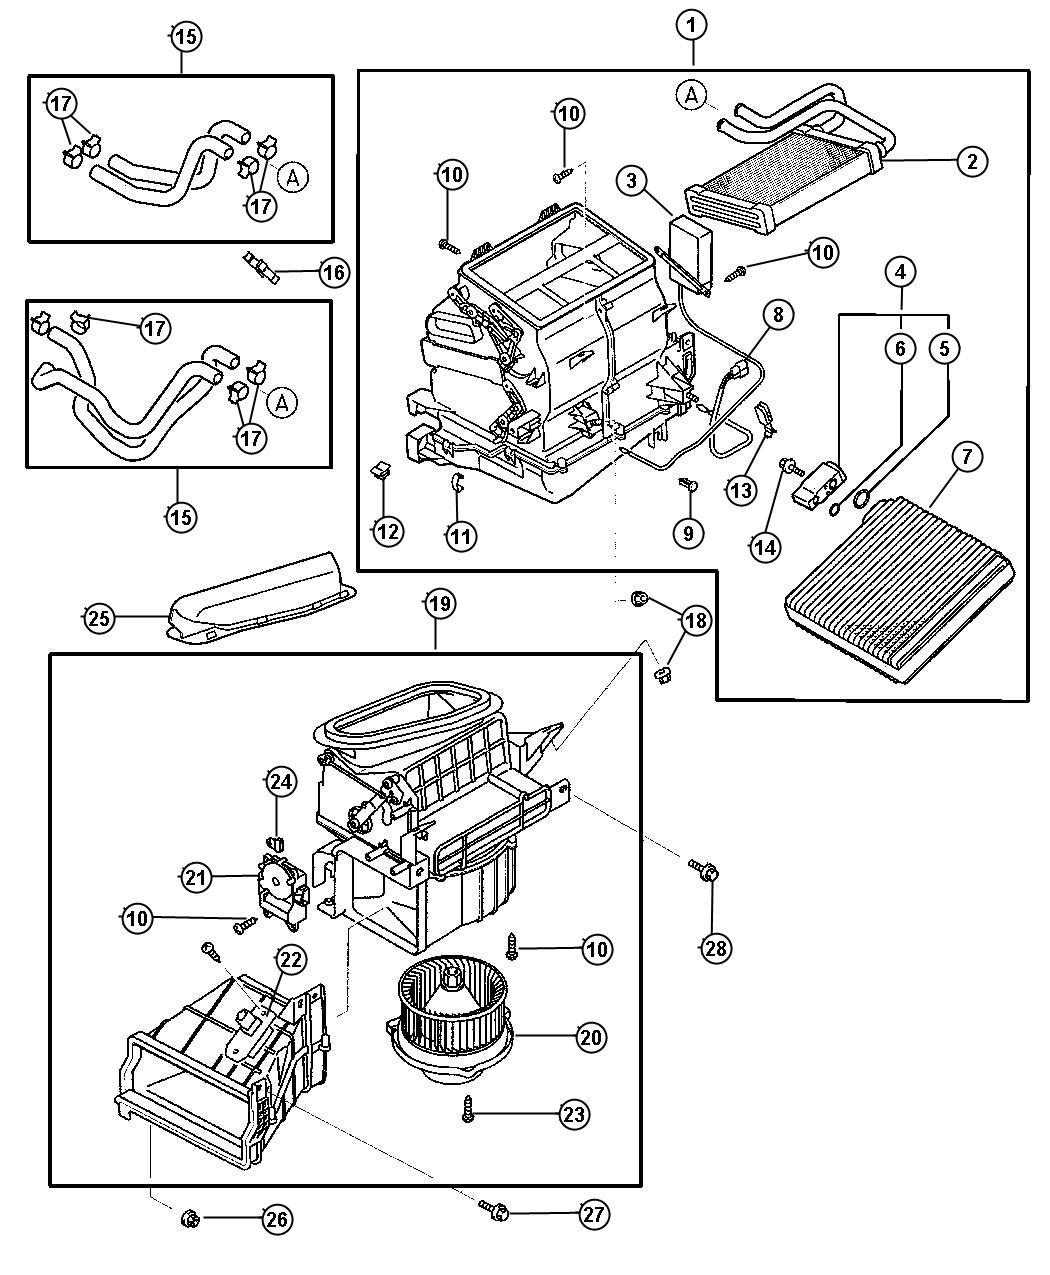 dodge caravan bolt  m6x20  washer  rear  seat